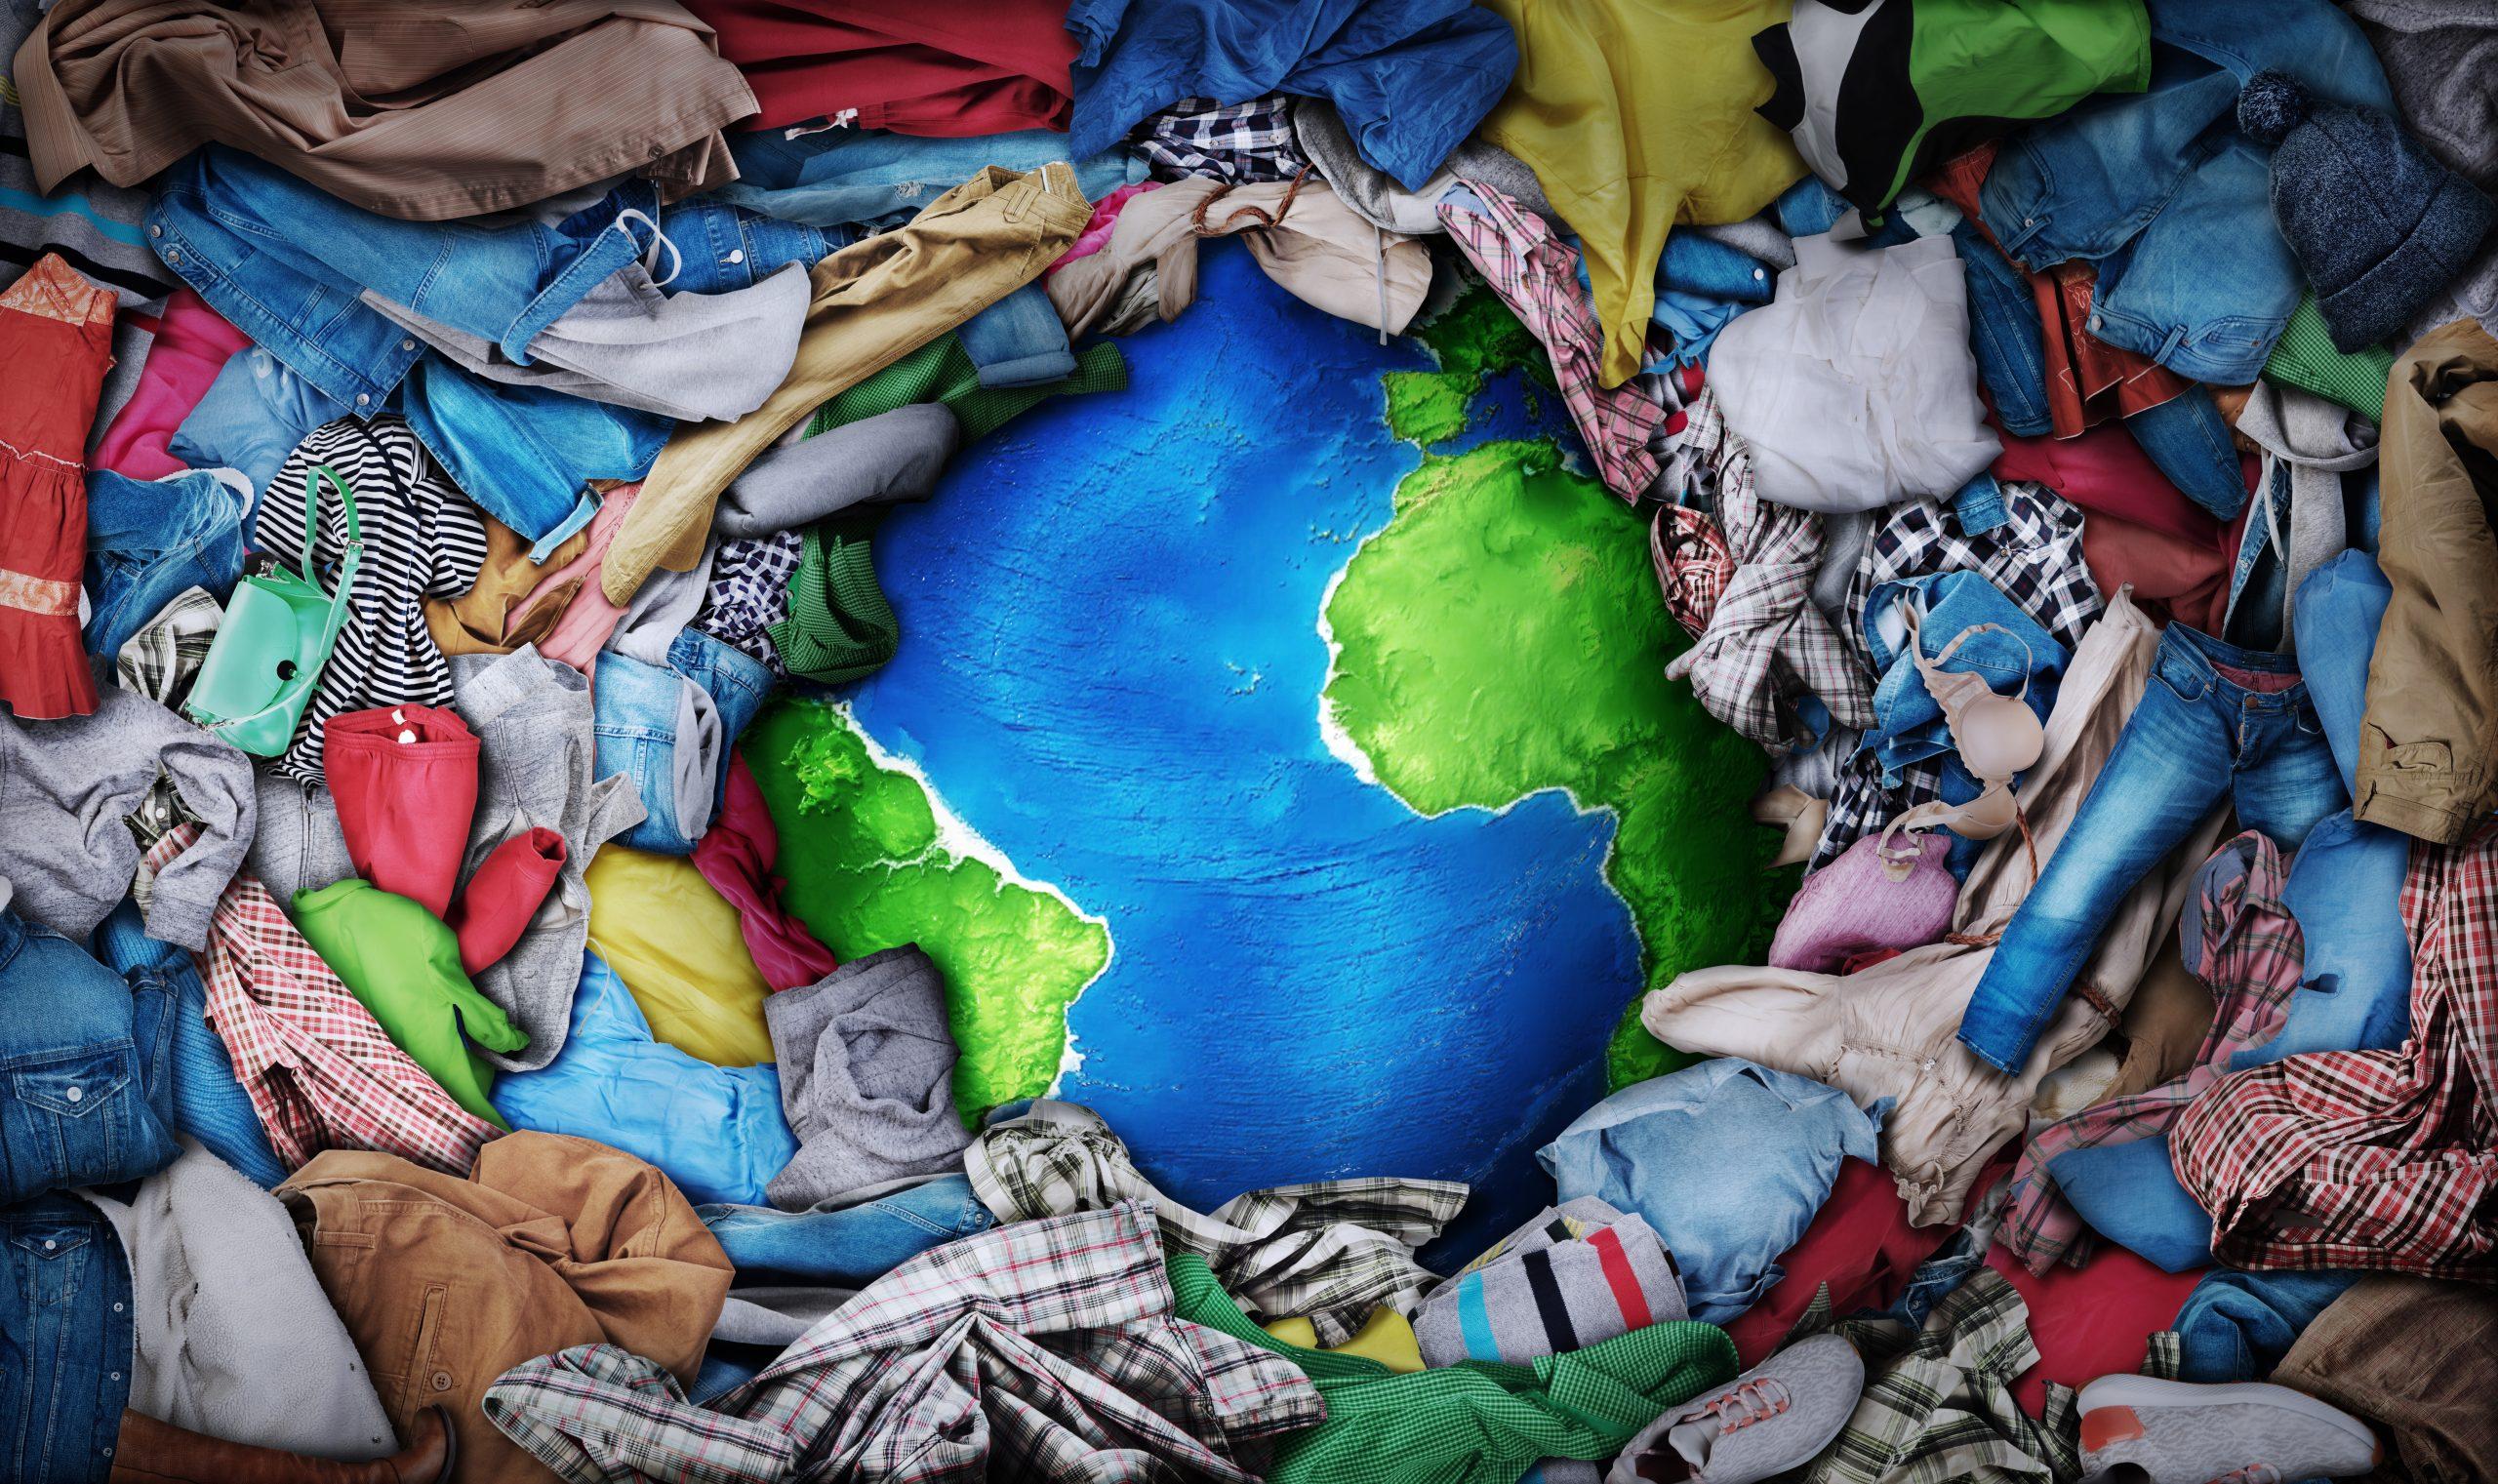 Global Laundry Crisis